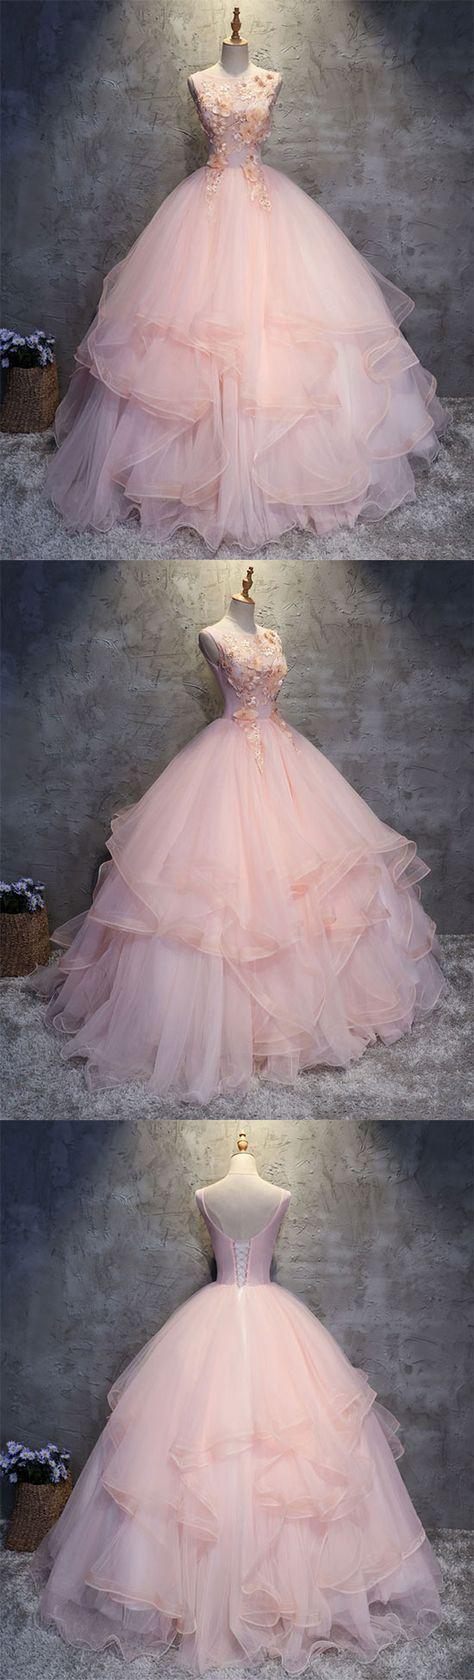 Pink round neck tulle lace applique long prom dress, pink evening dress #spitzeapplique